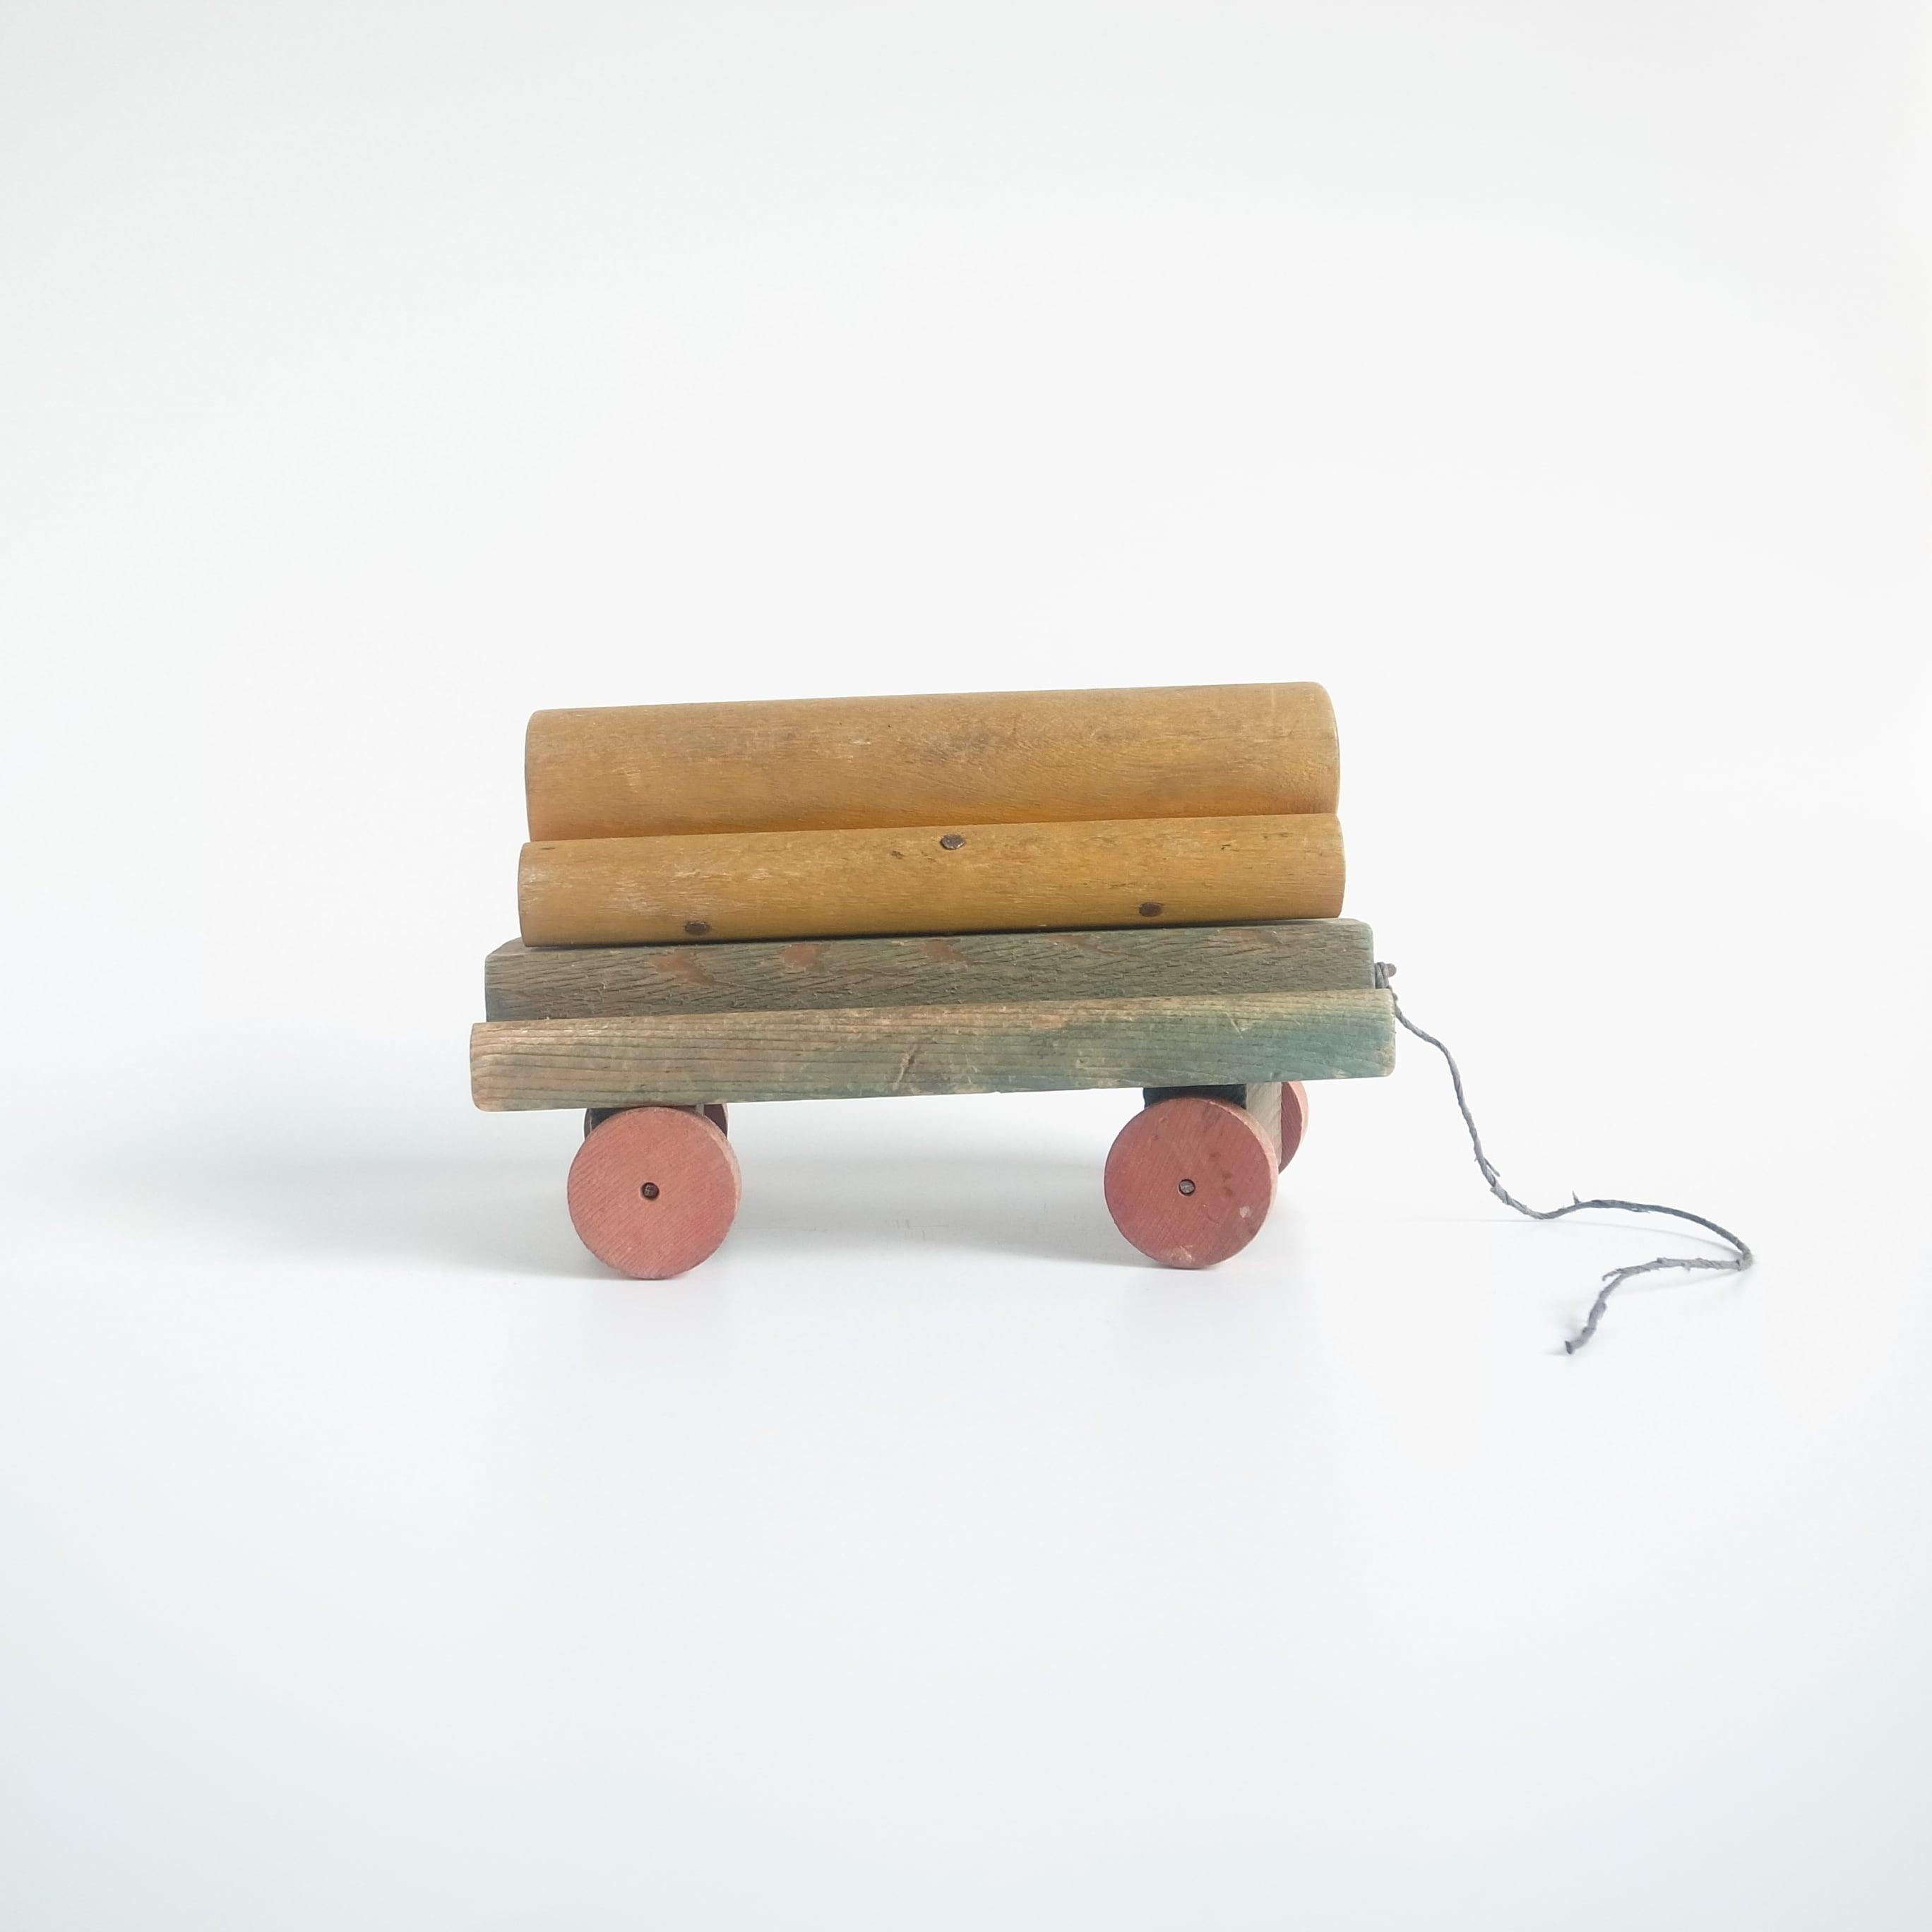 Wooden toy flatcar